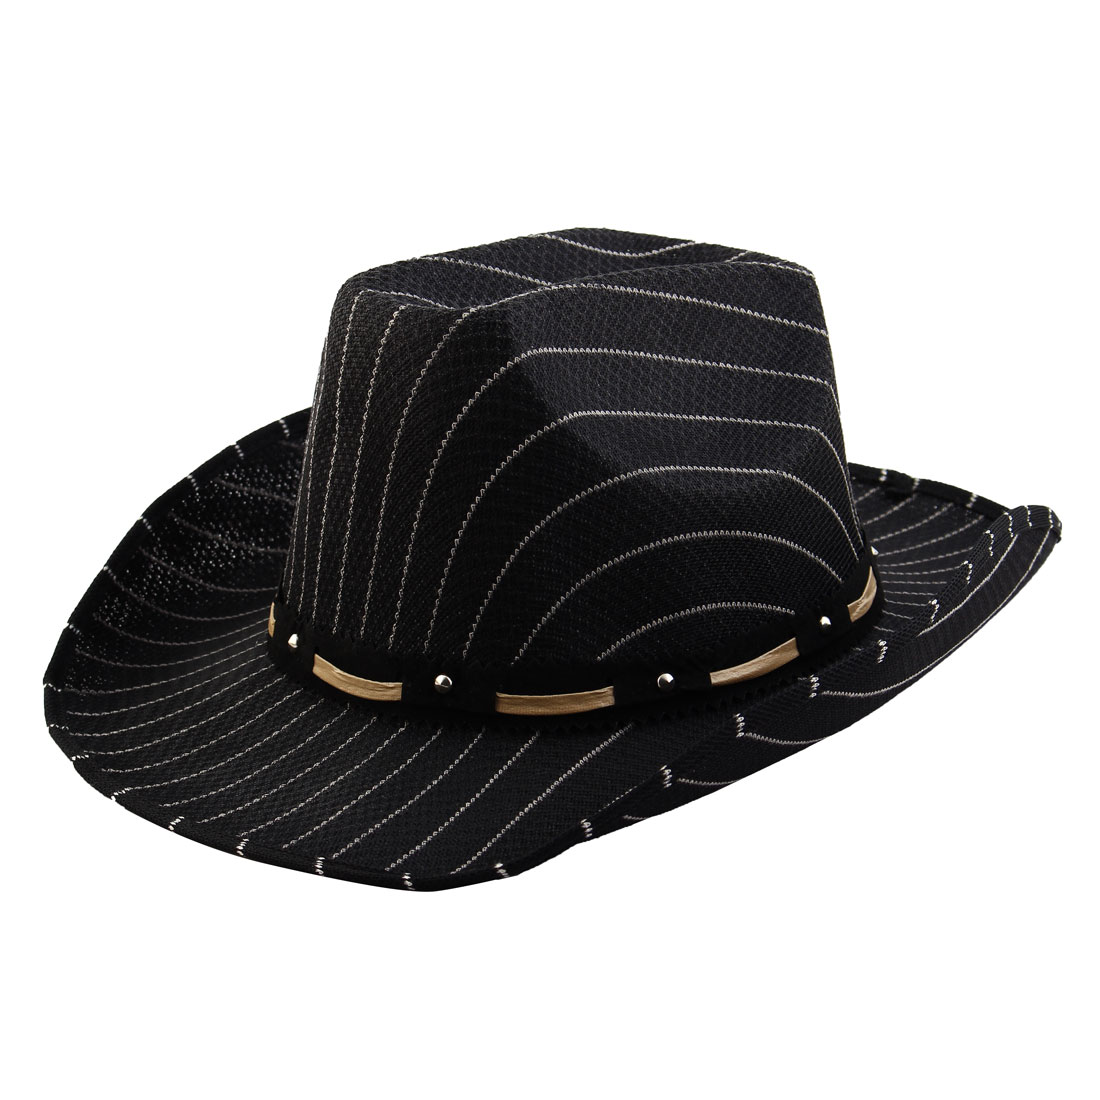 Summer Outdoor Linen Stripe Pattern Breathable Wide Brim Sunhat Cowboy Hat Black